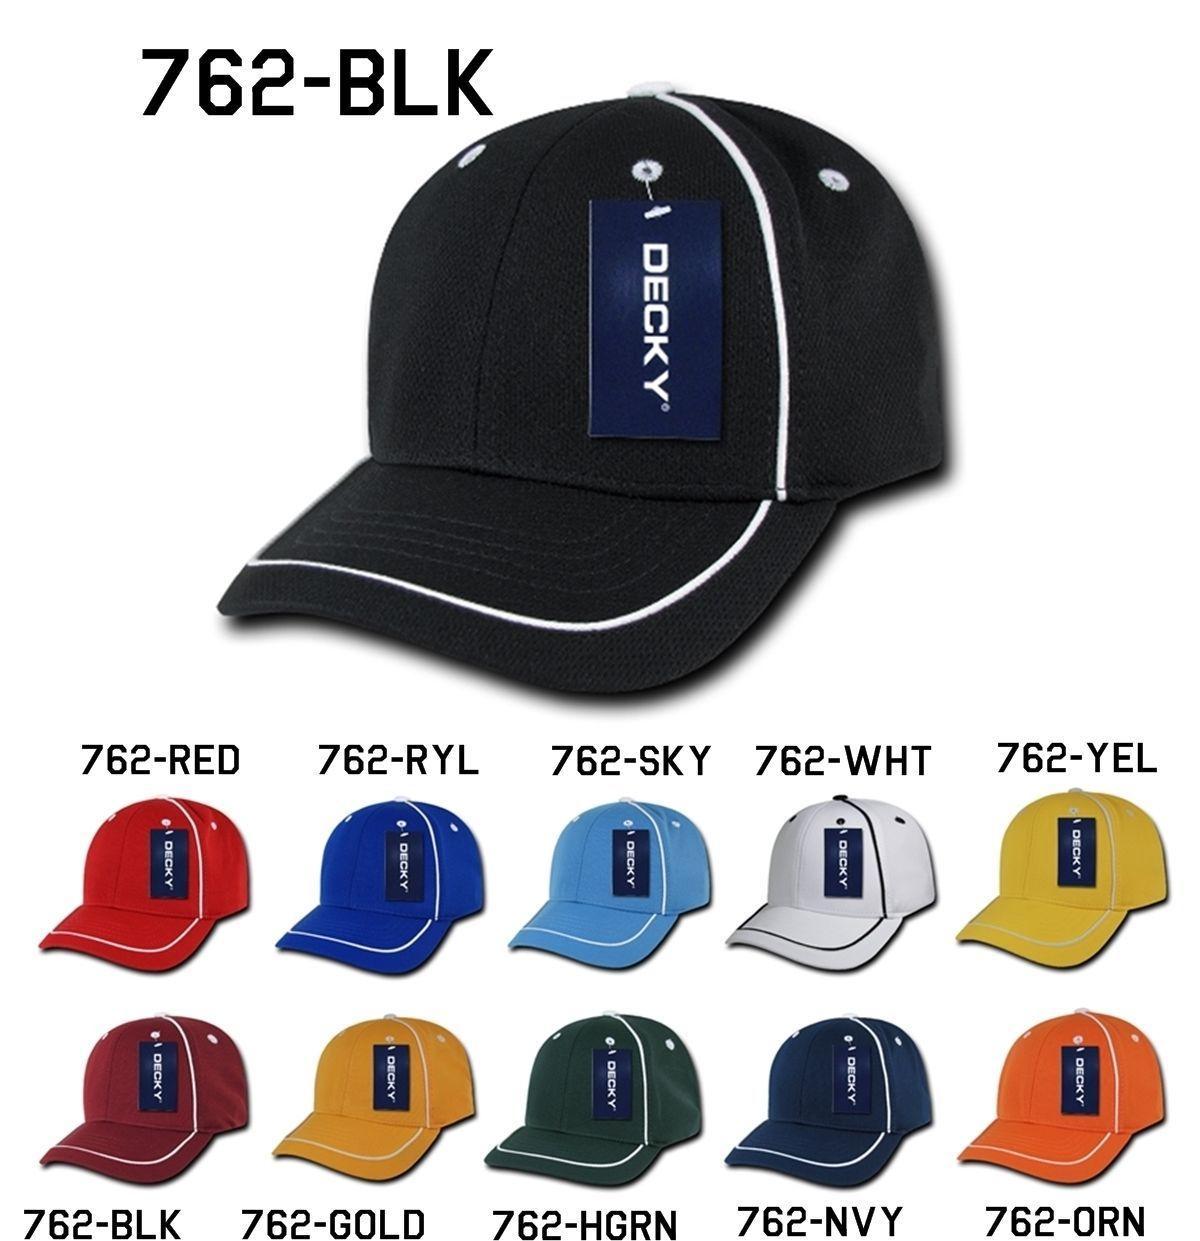 DECKY Blank Performance Mesh Piped Jersey Mesh Baseball snapback Caps Cap 762